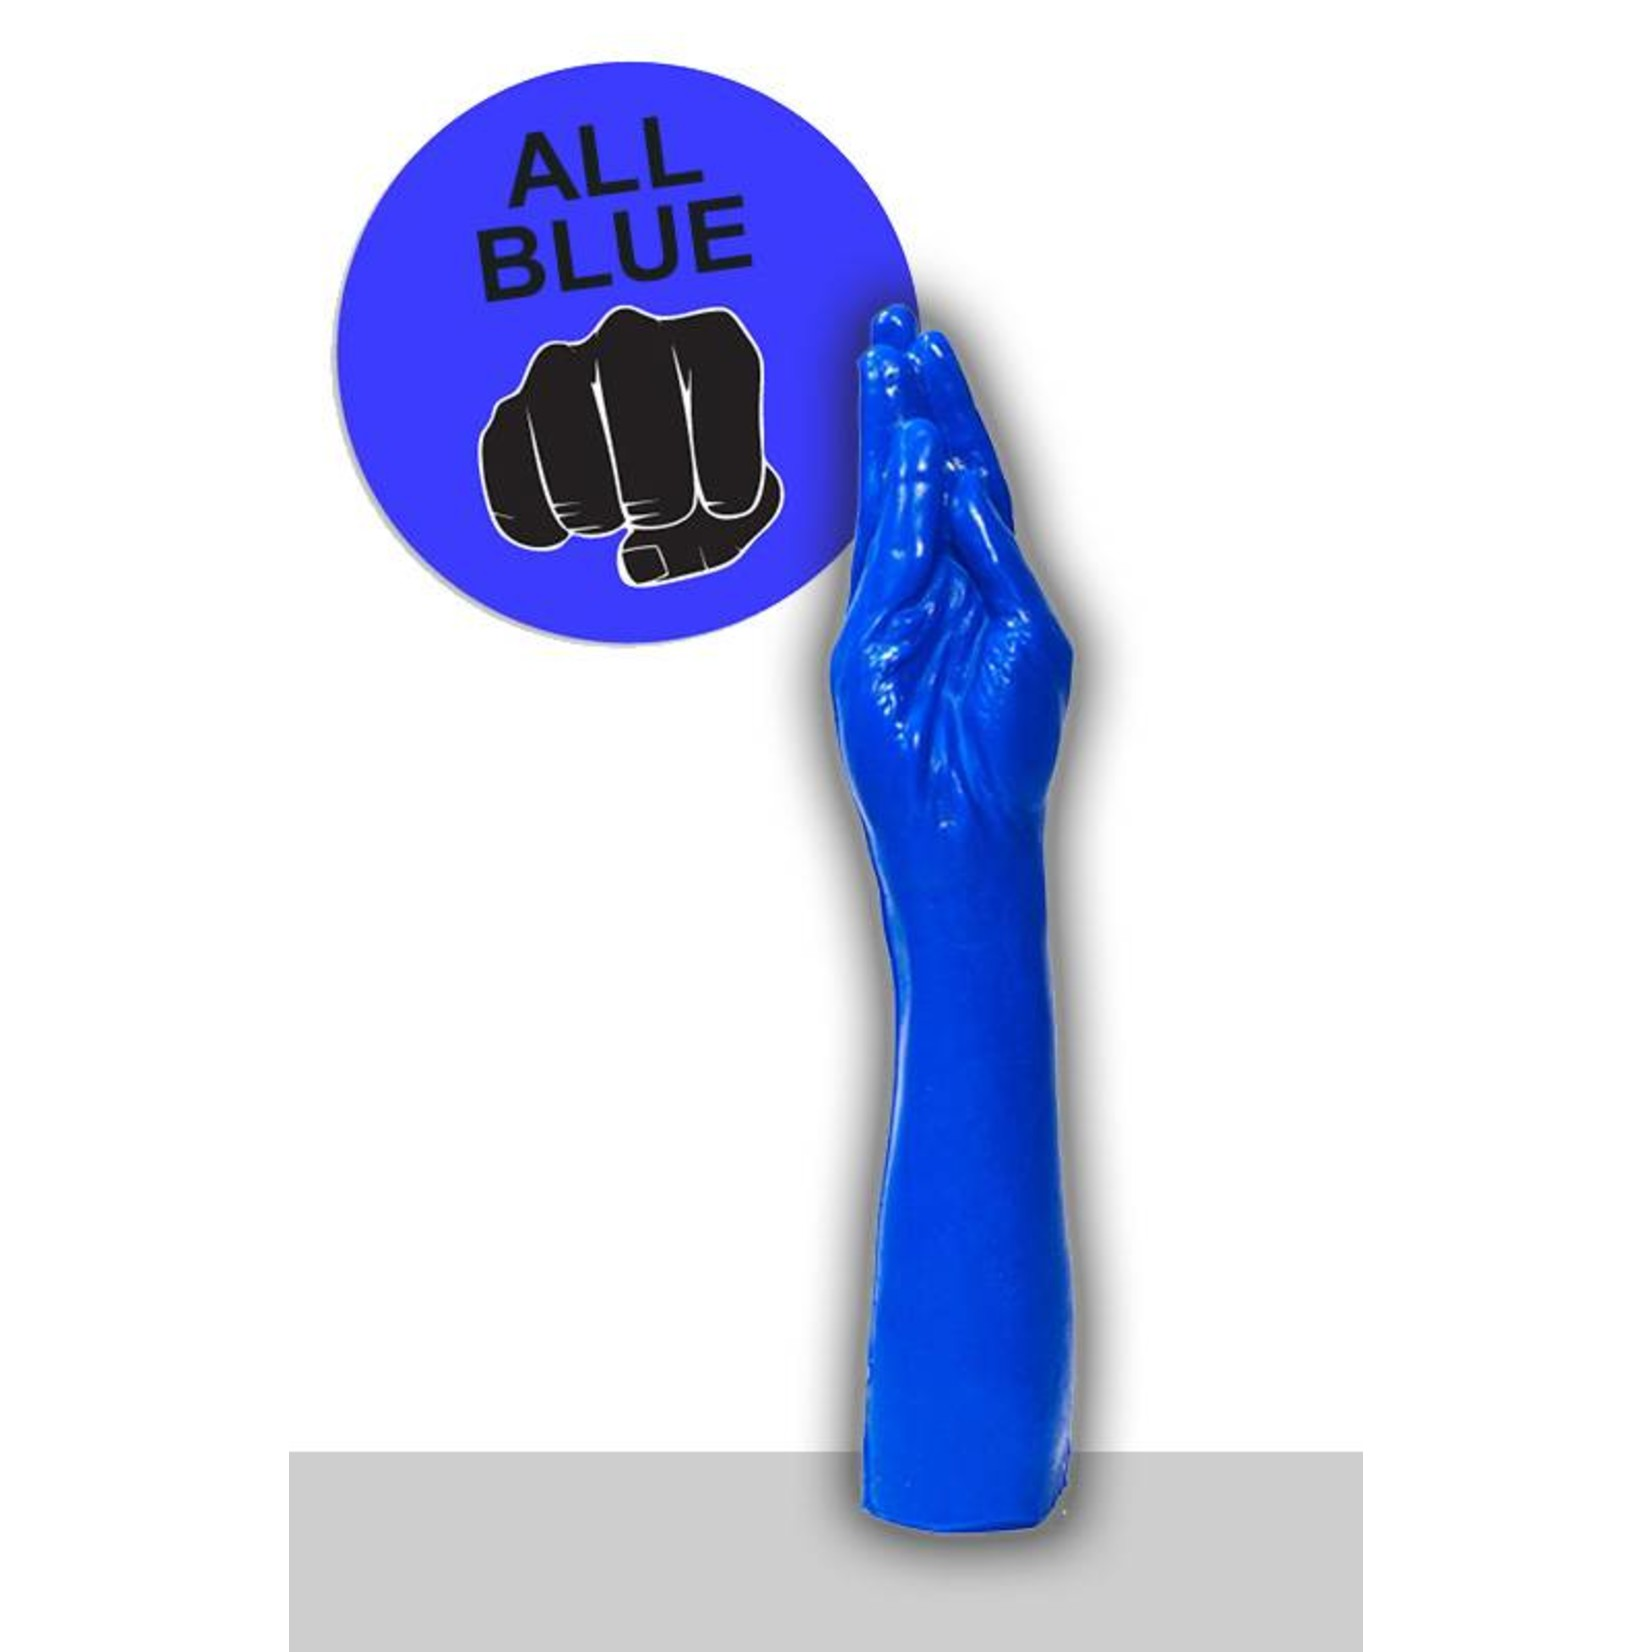 All Black All Blue Dildo - ABB 21